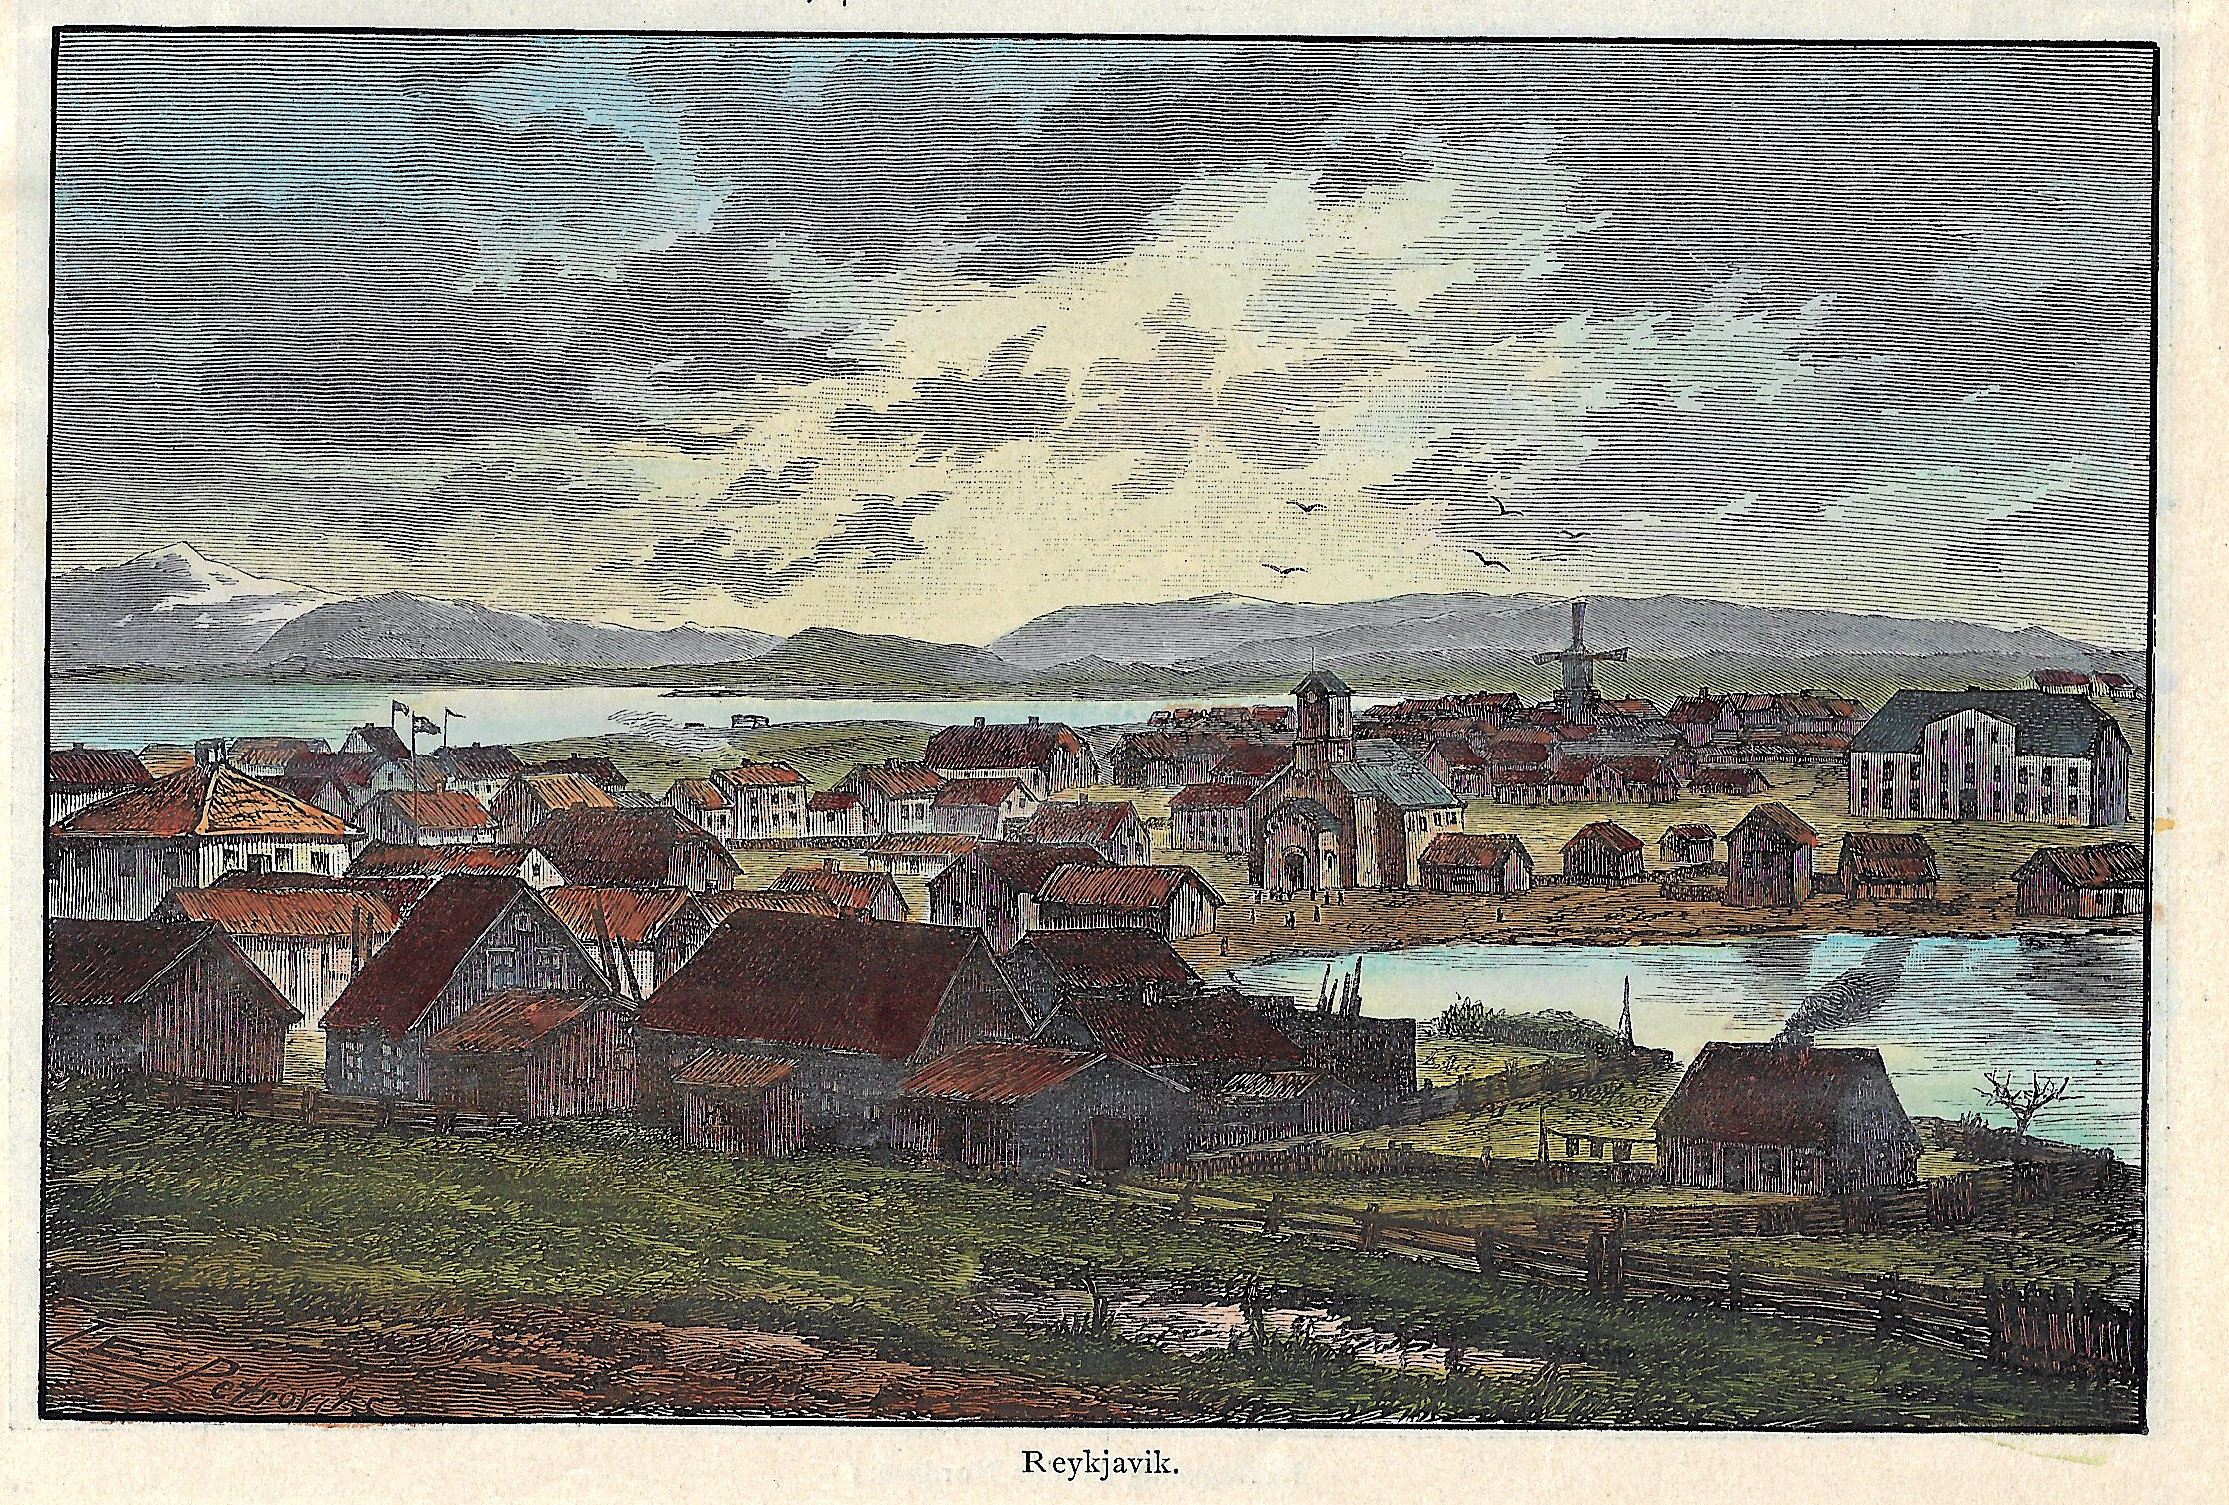 Petrovits E. Reykjavik.